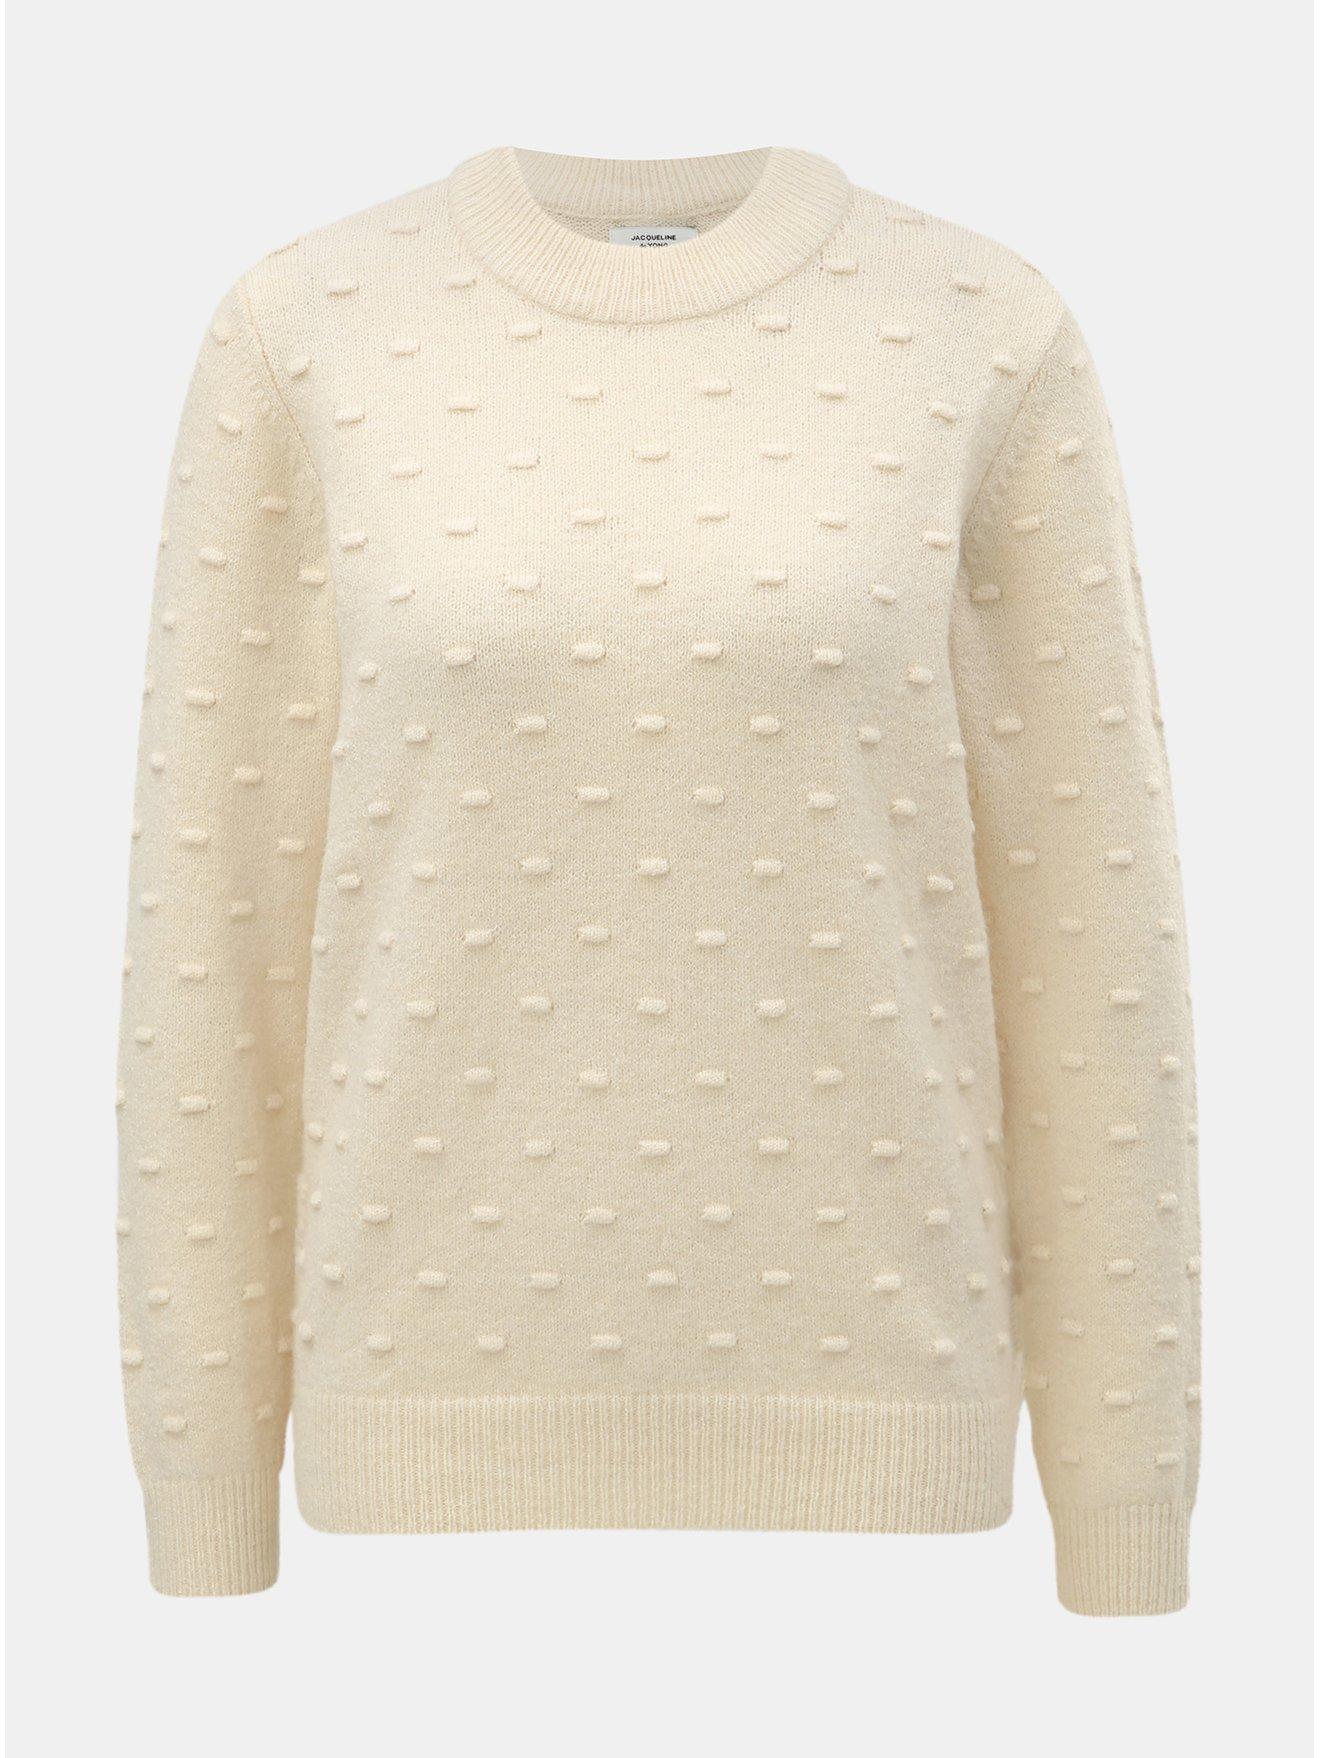 Béžový svetr s plastickým vzorem Jacqueline de Yong Dotta 8782481338